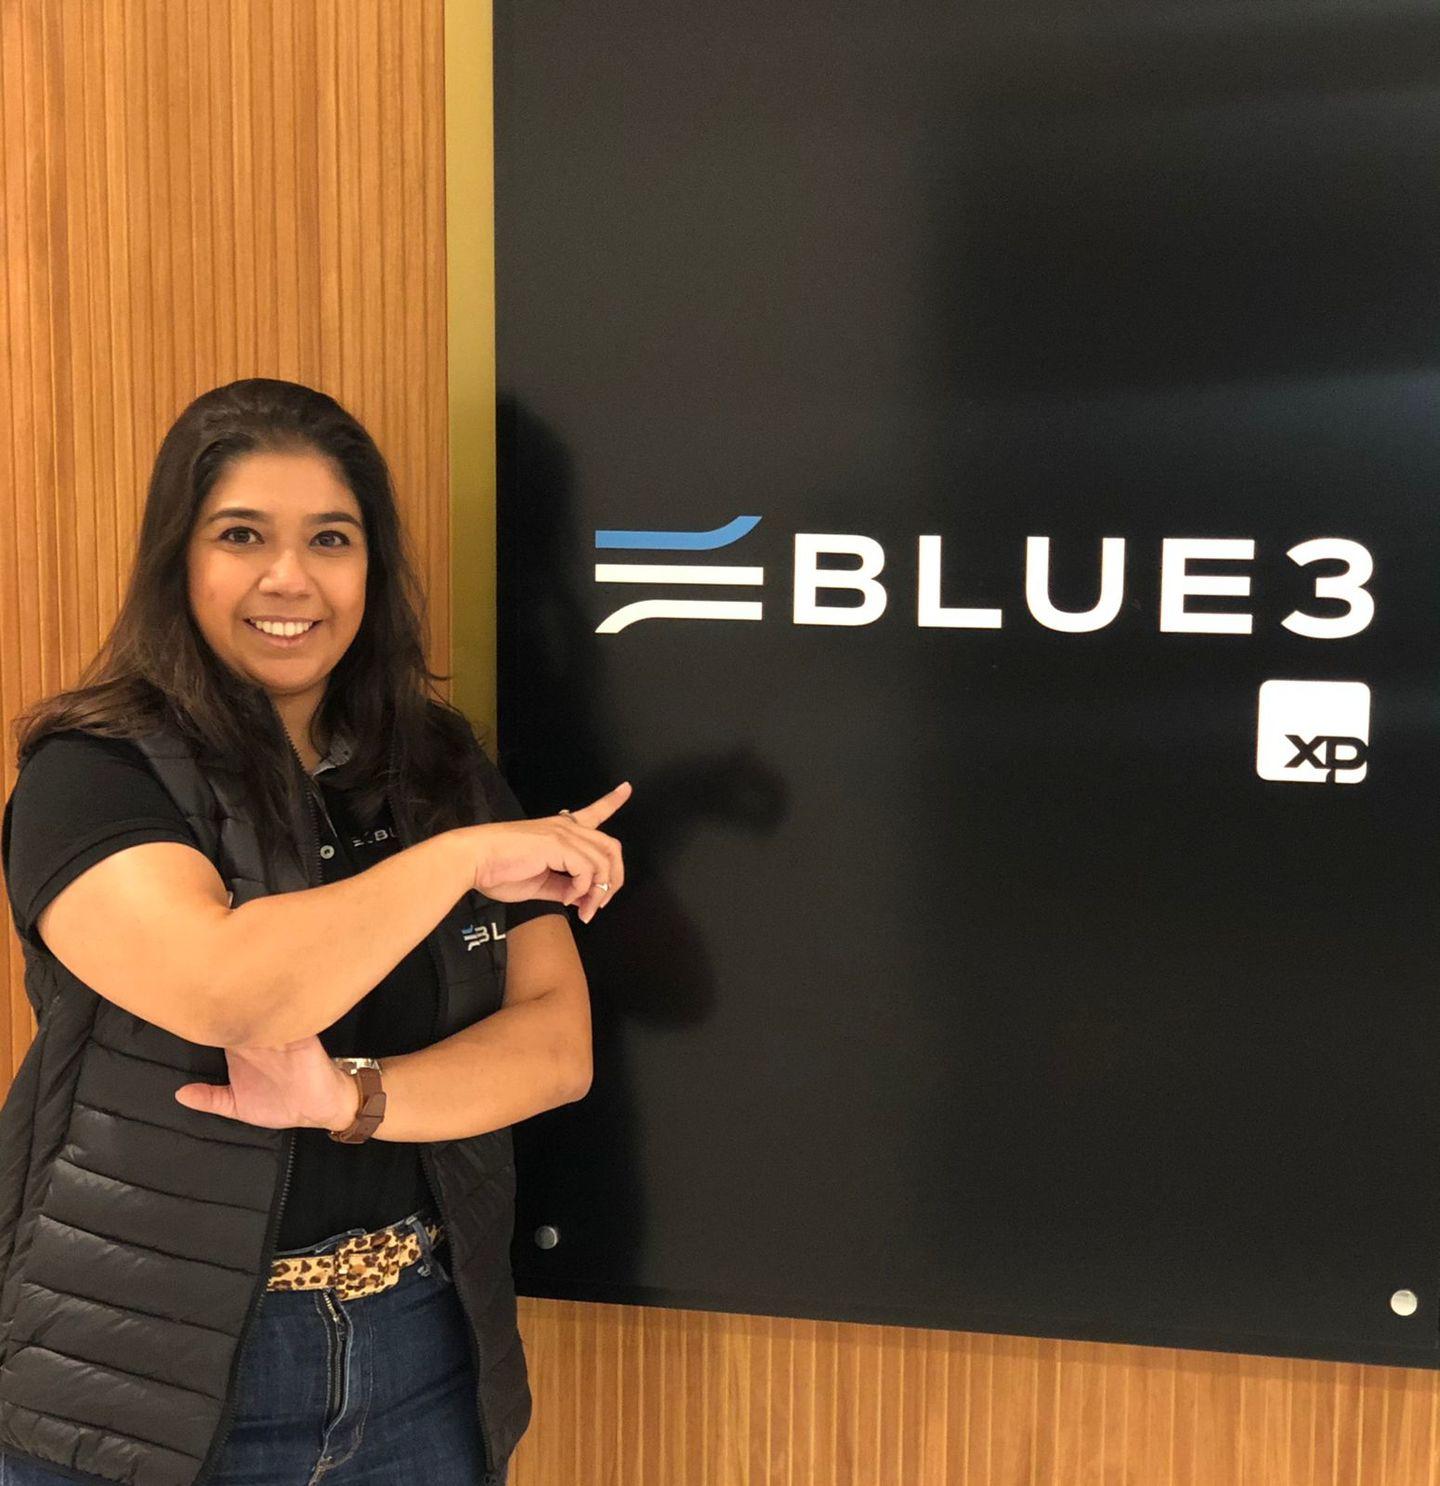 Renata Amaral, nova colaboradora da Blue3